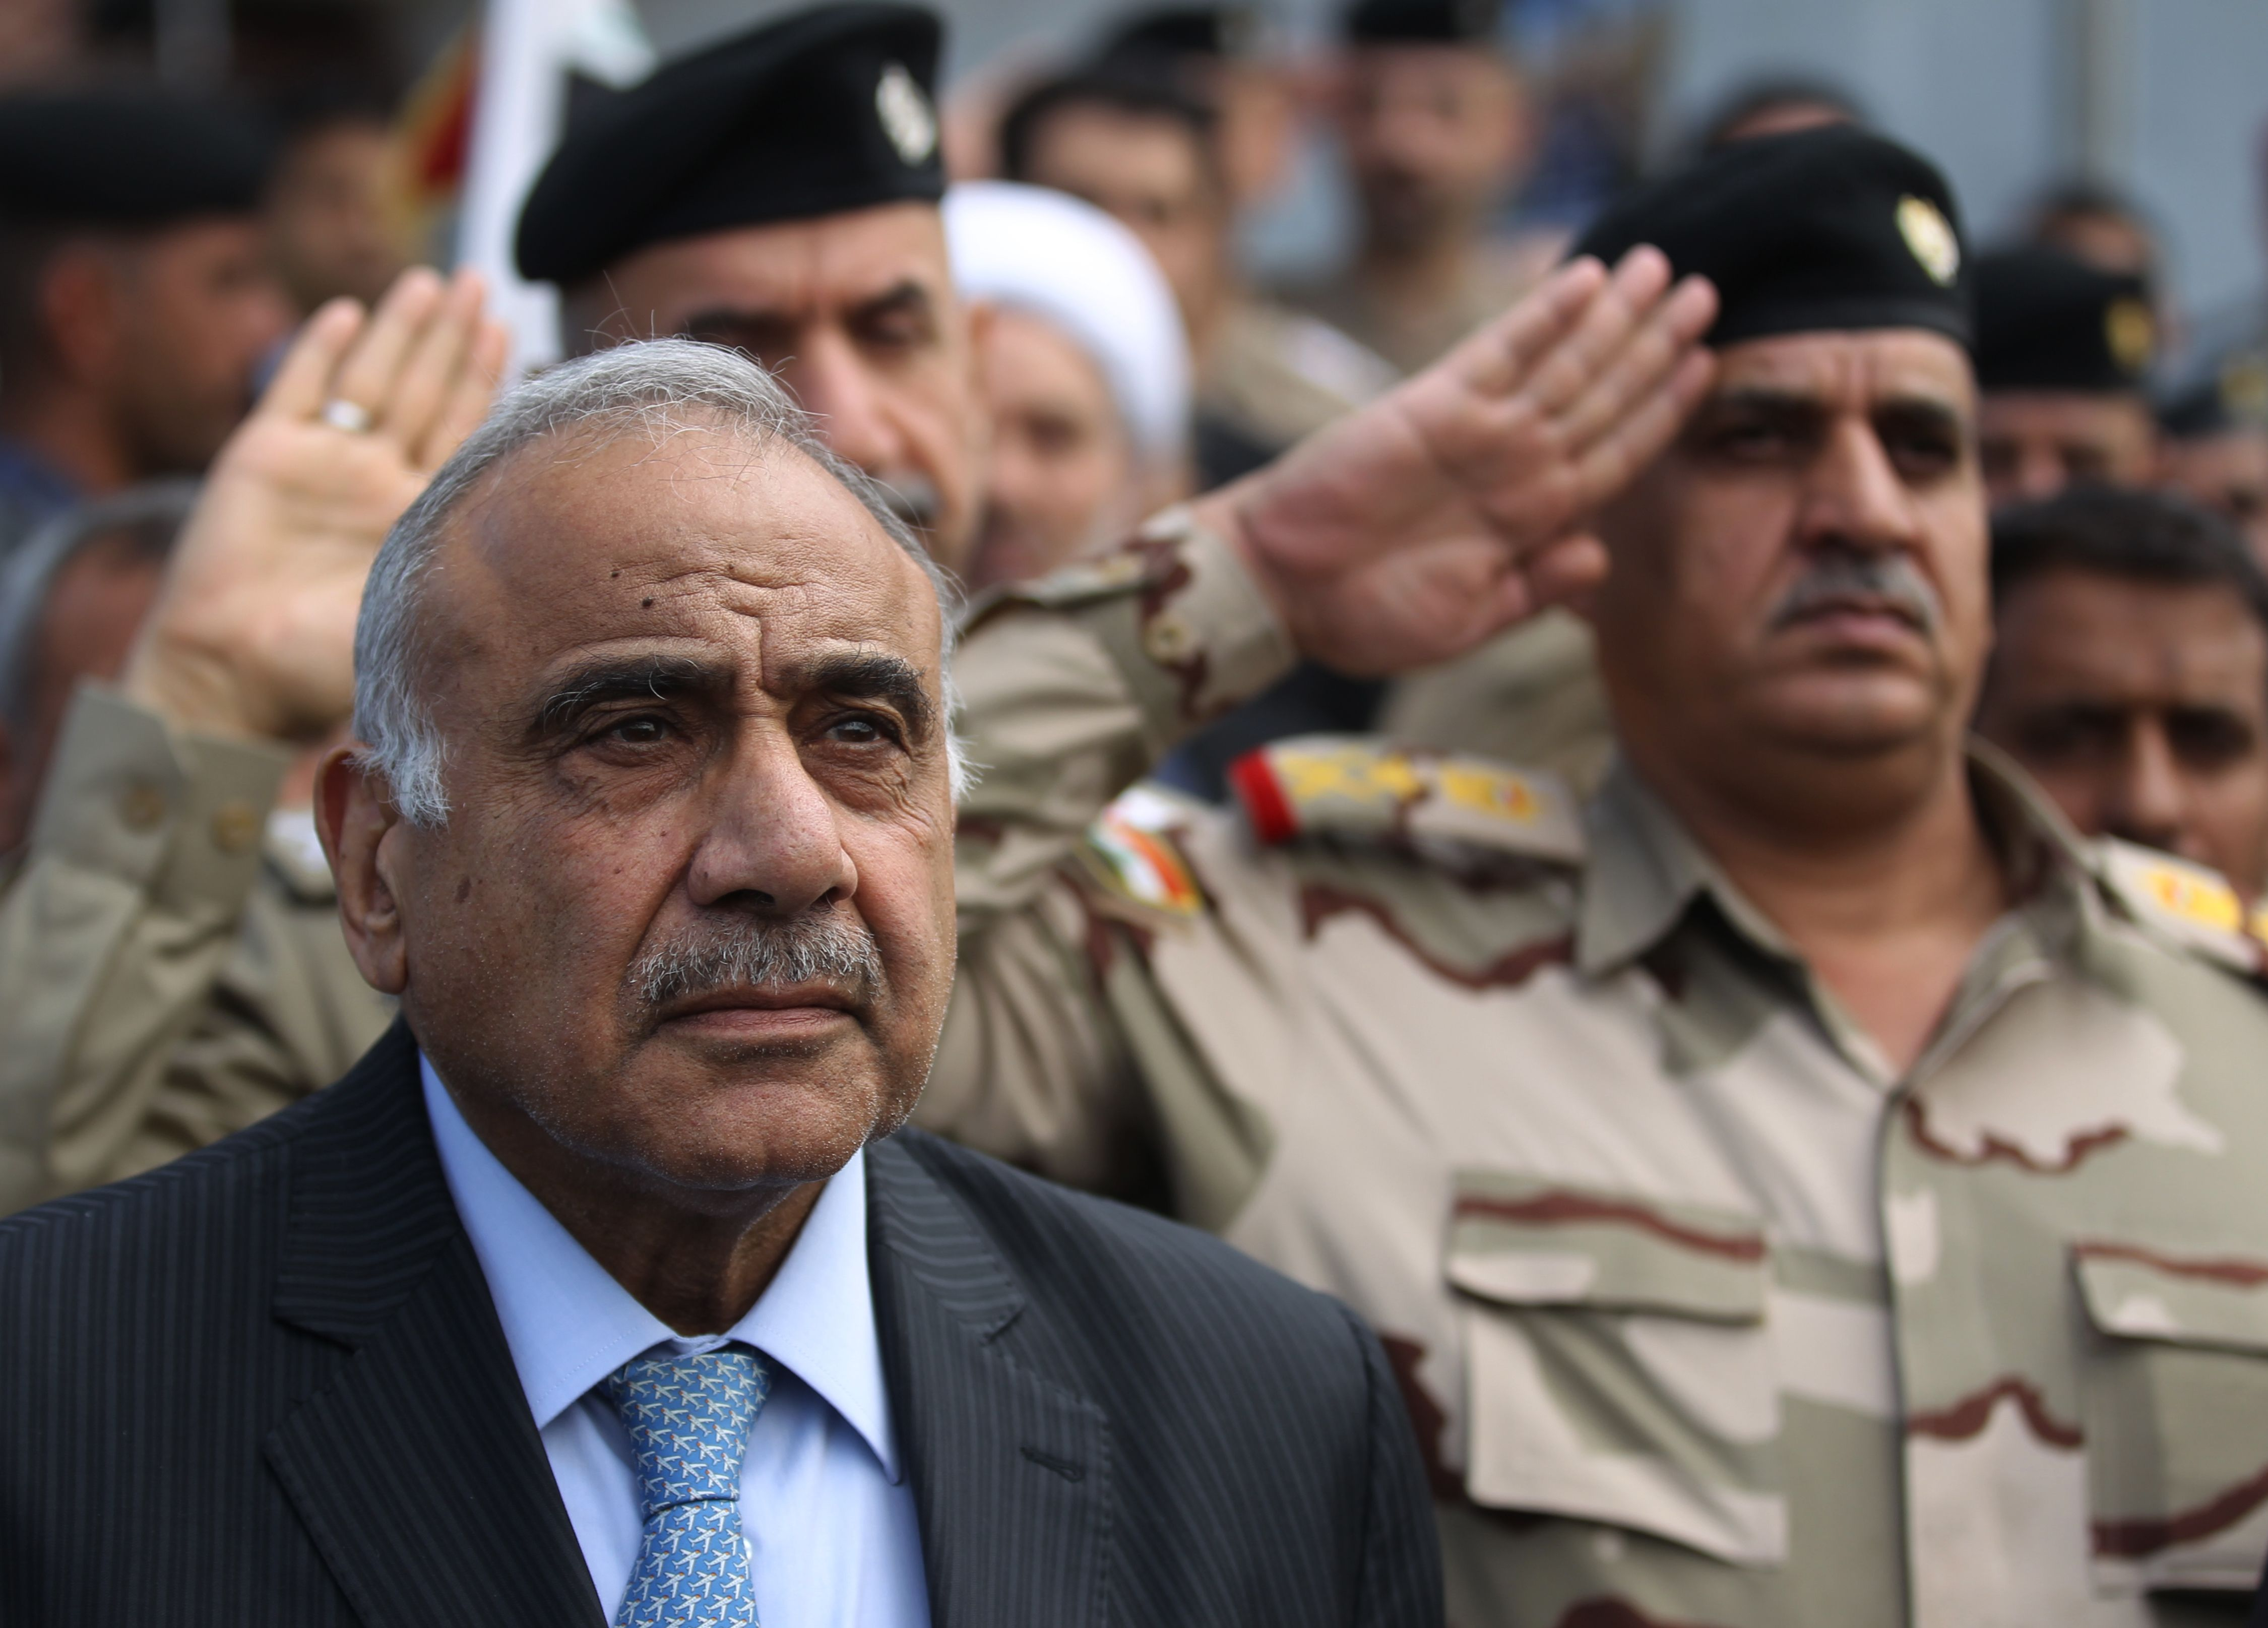 AHMAD AL-RUBAYE/AFP via Getty Images